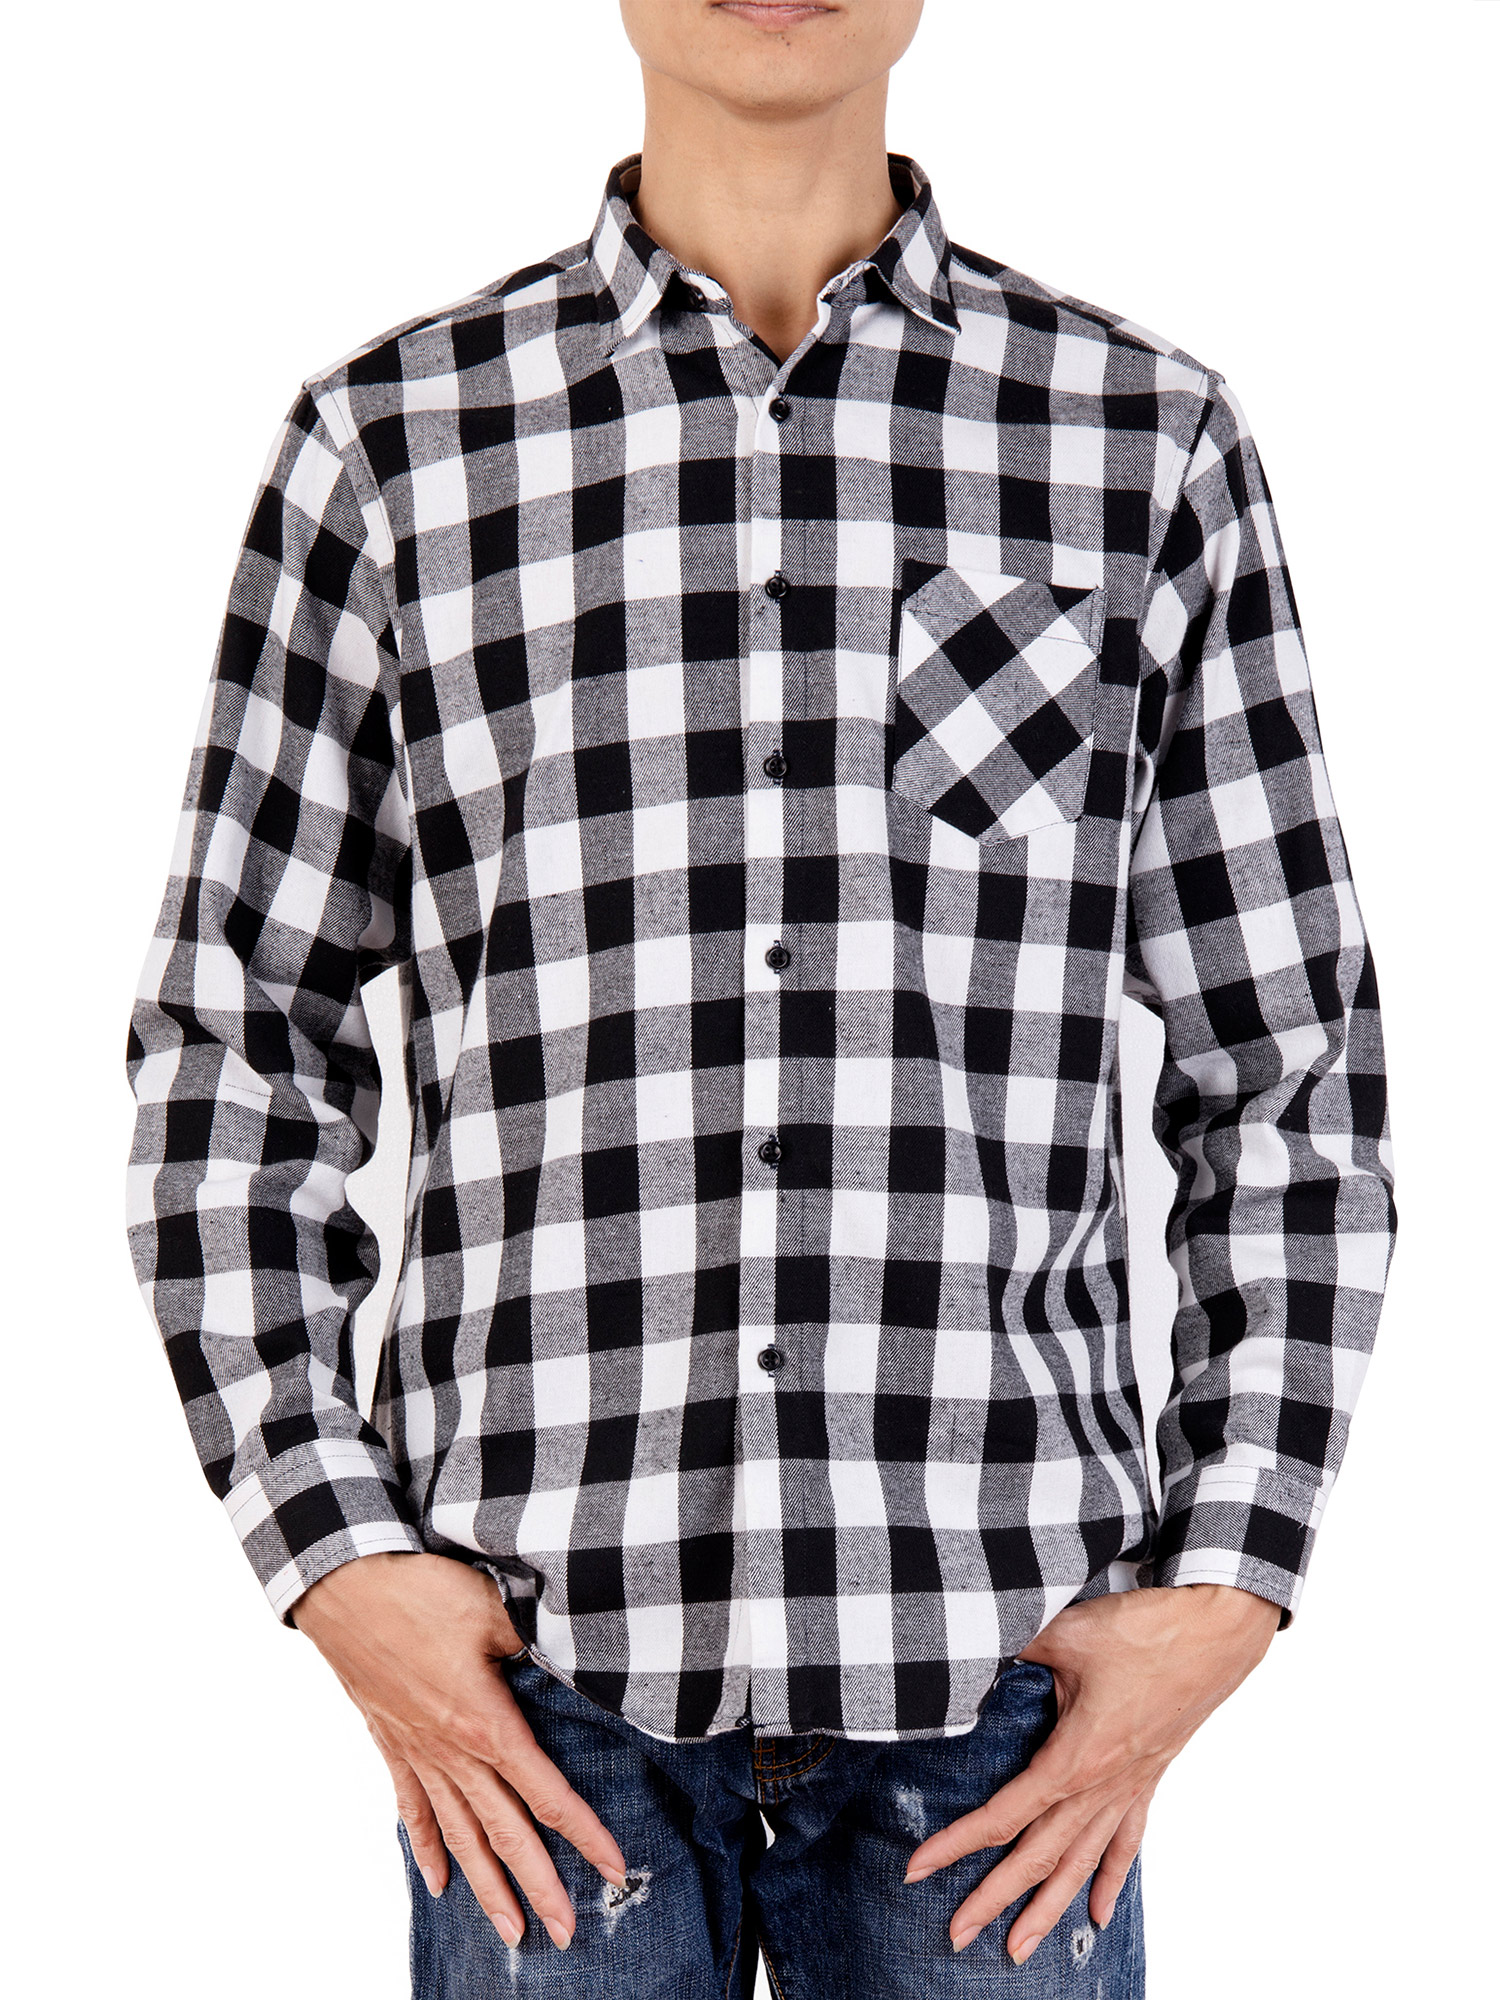 YYear Mens Big /& Tall Plaid Casual Long Sleeve Button Up Shirts